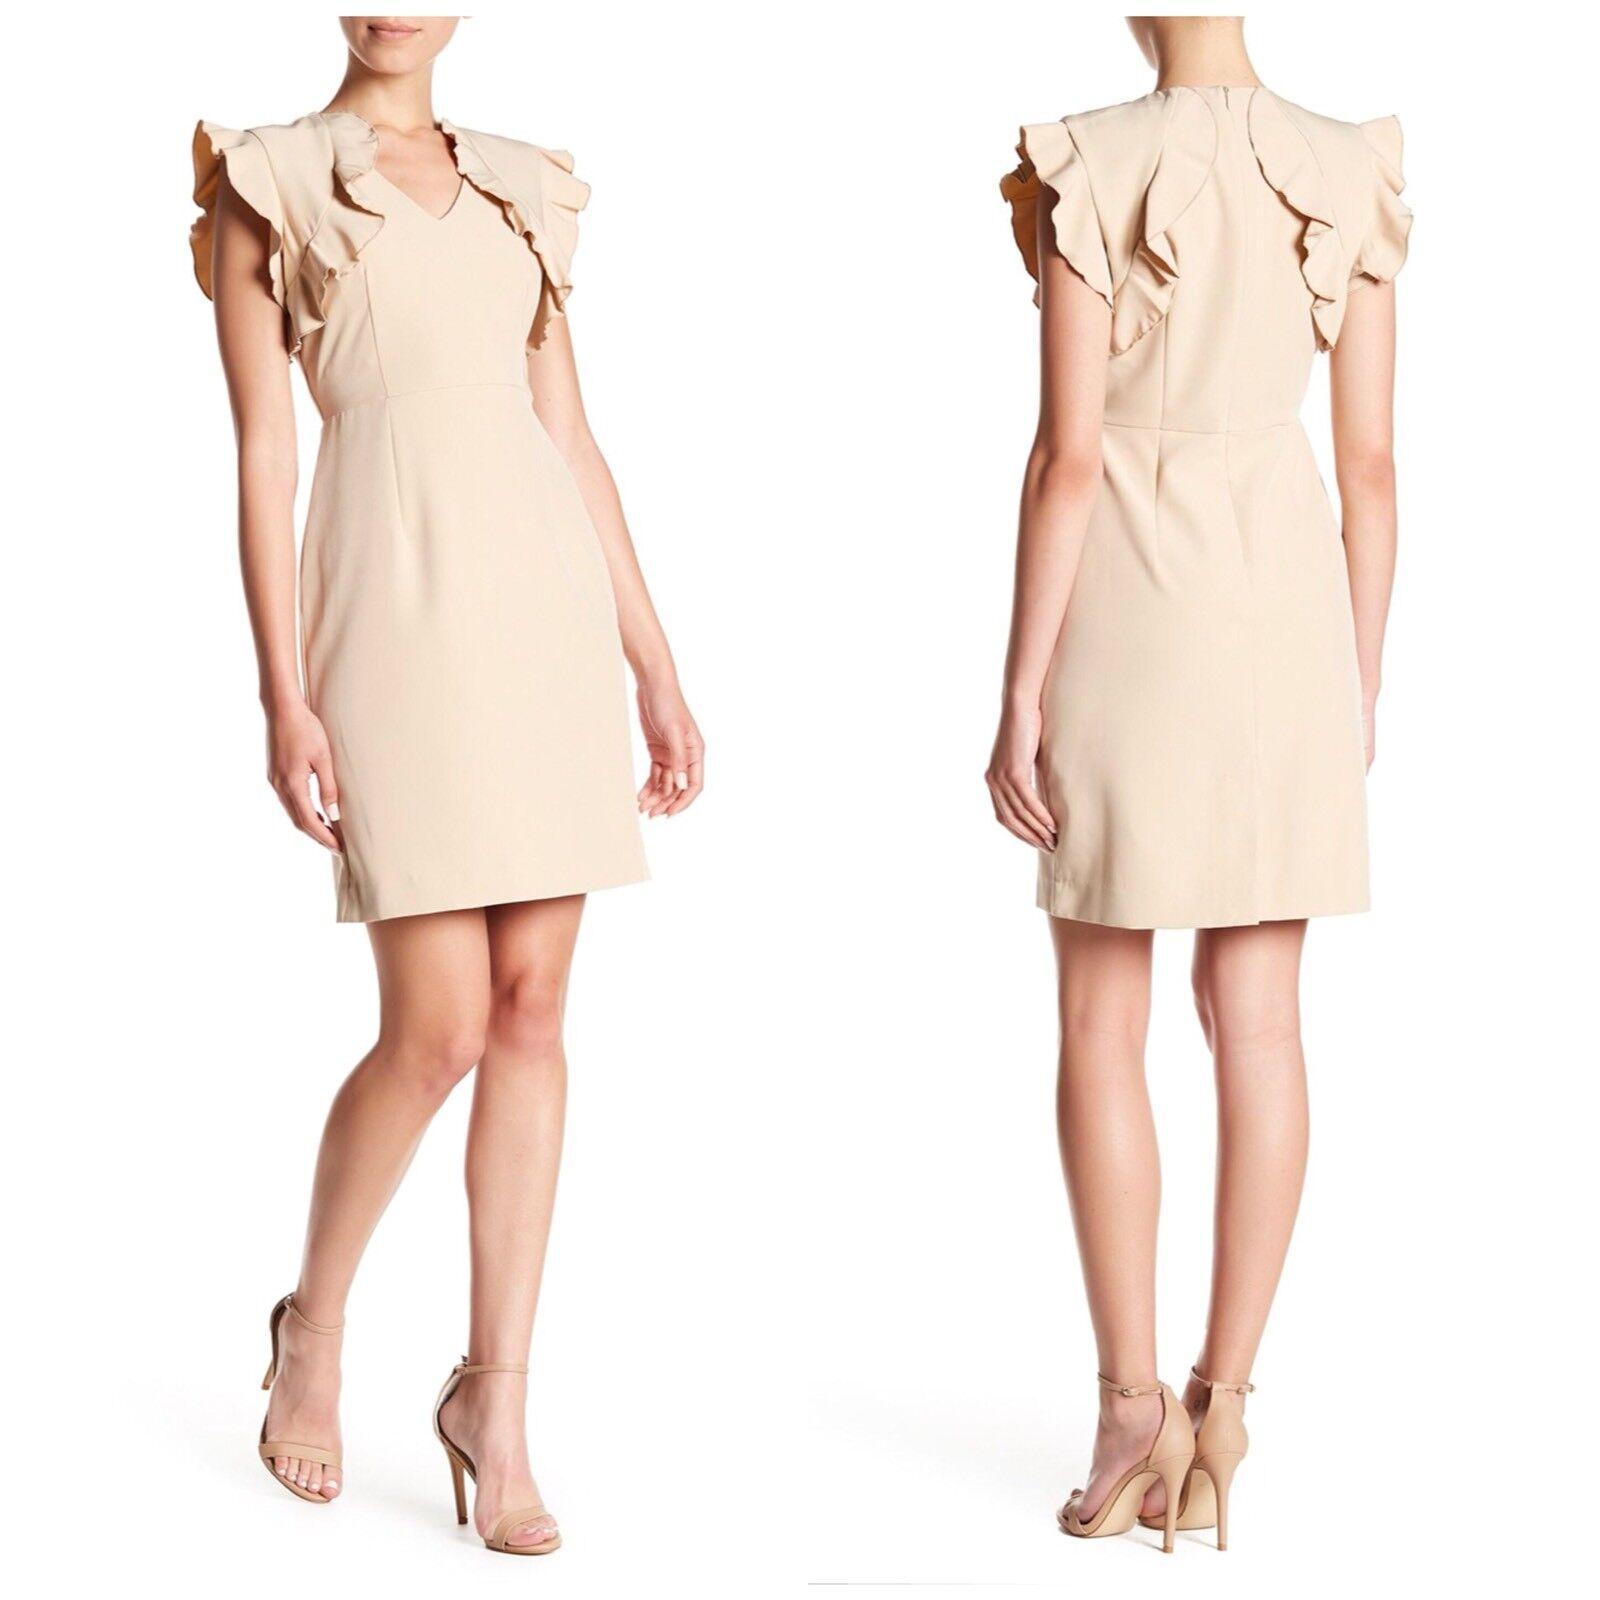 Sharagano Women's Size 10P Natural Ruffle Trim Trim Trim Career Dress In Nude Beige 11b1eb